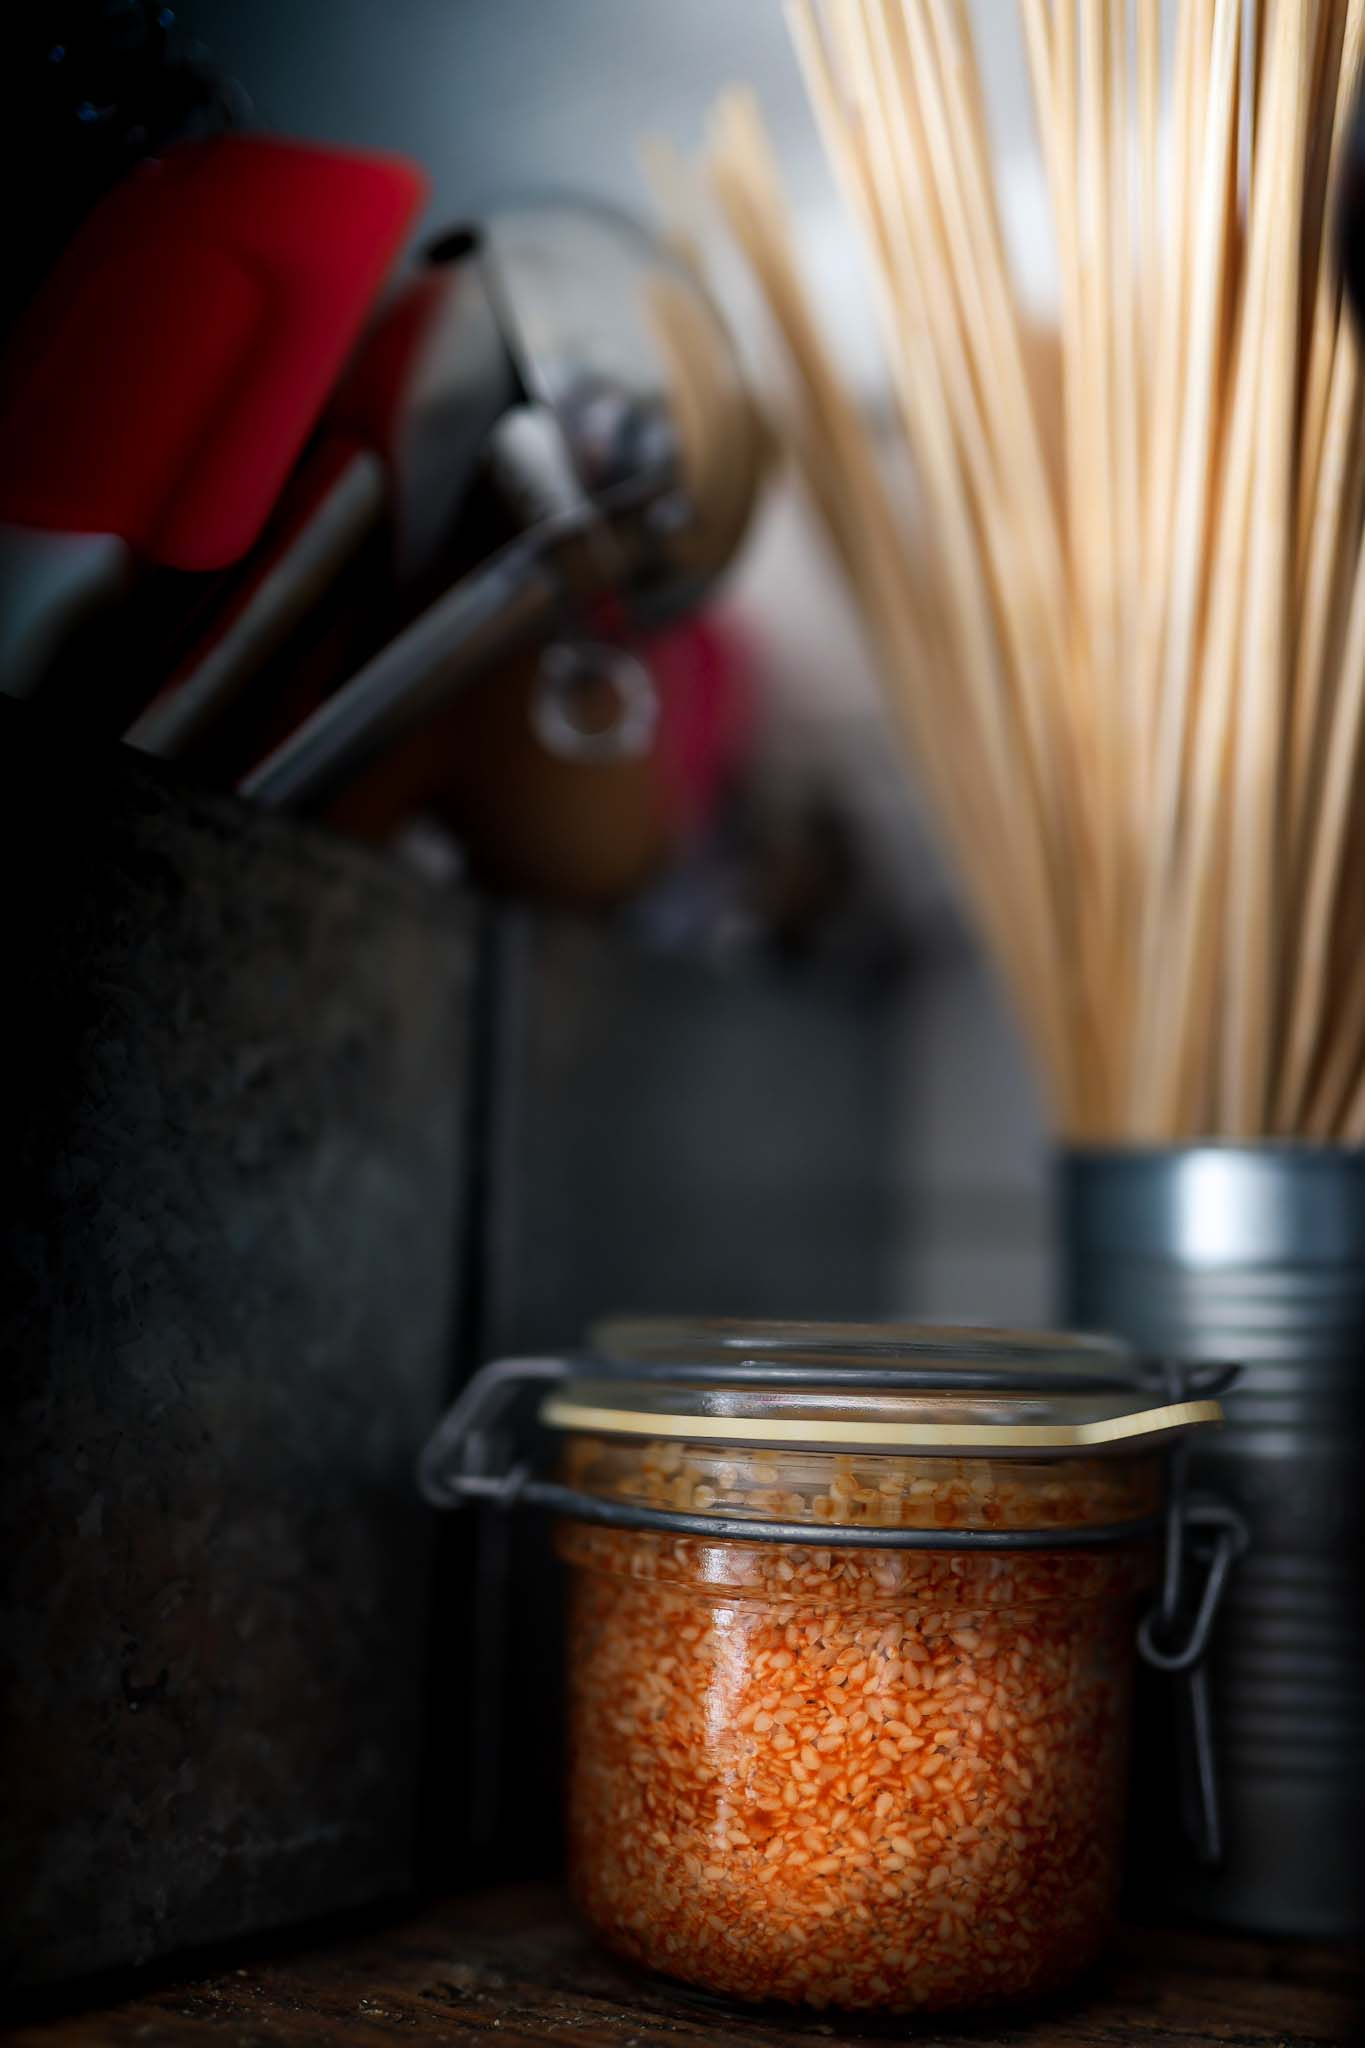 miljöbild över köksprodukter